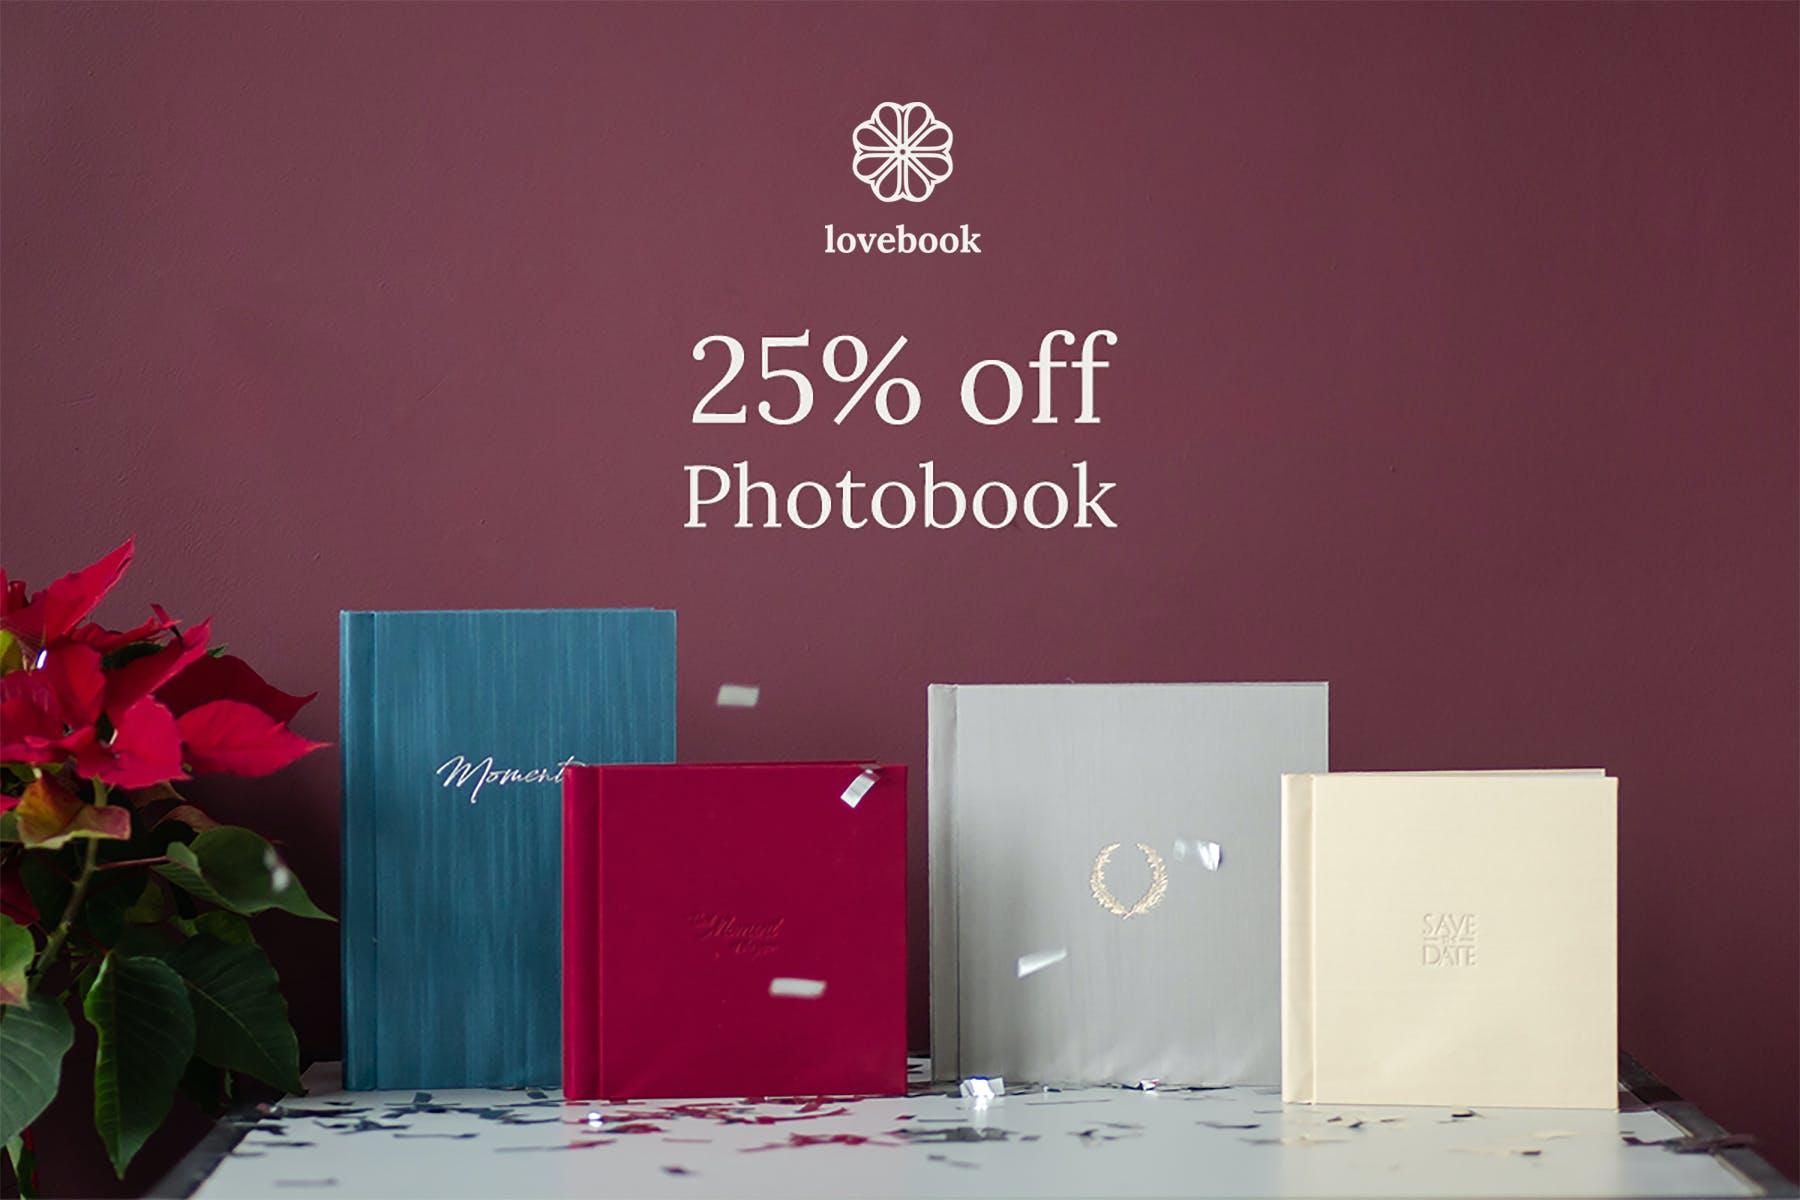 Lovebook Black Friday 2019 discount on photobooks for photographers